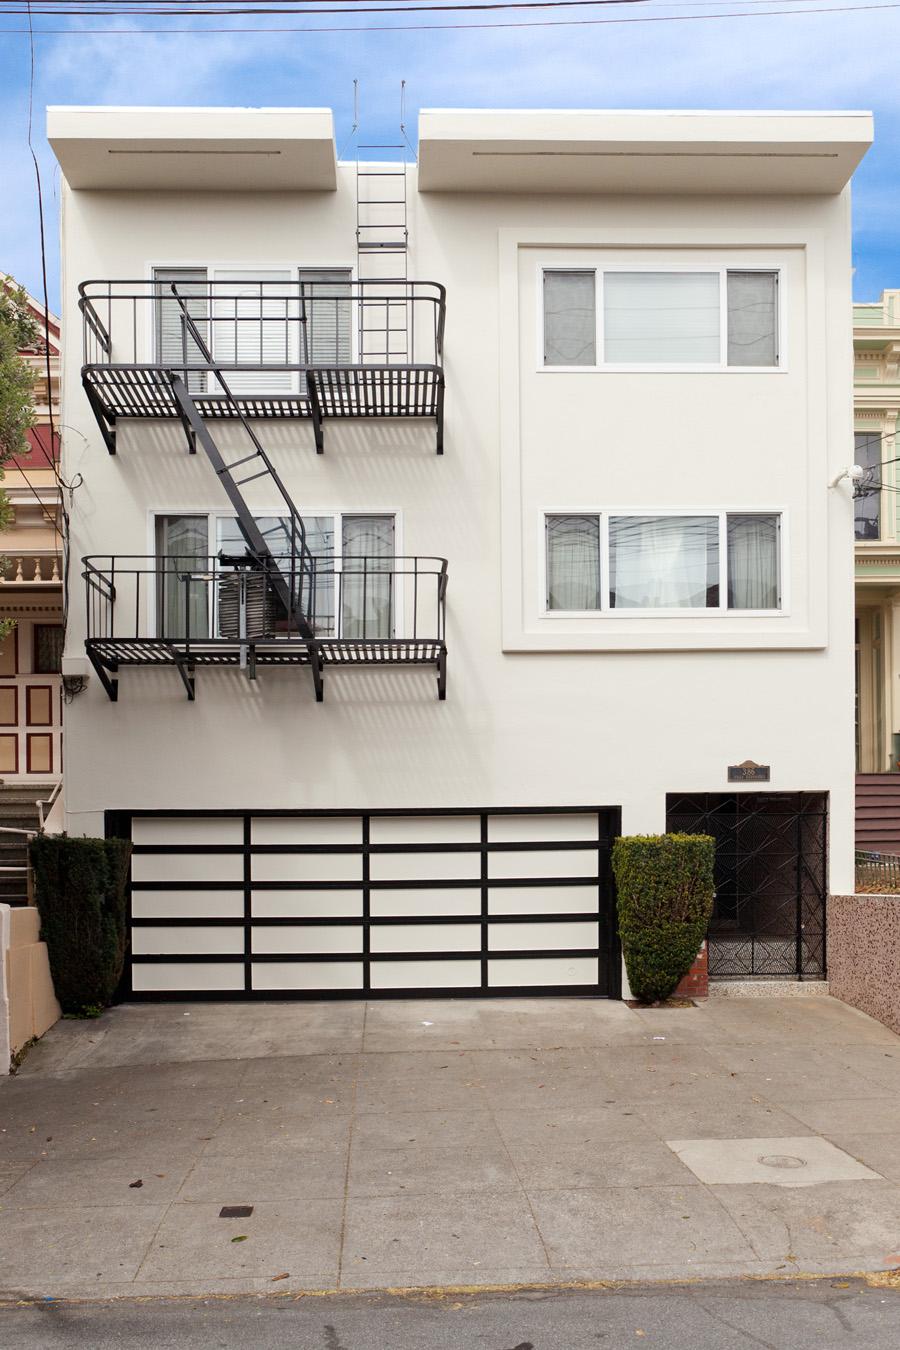 386 San Jose Ave